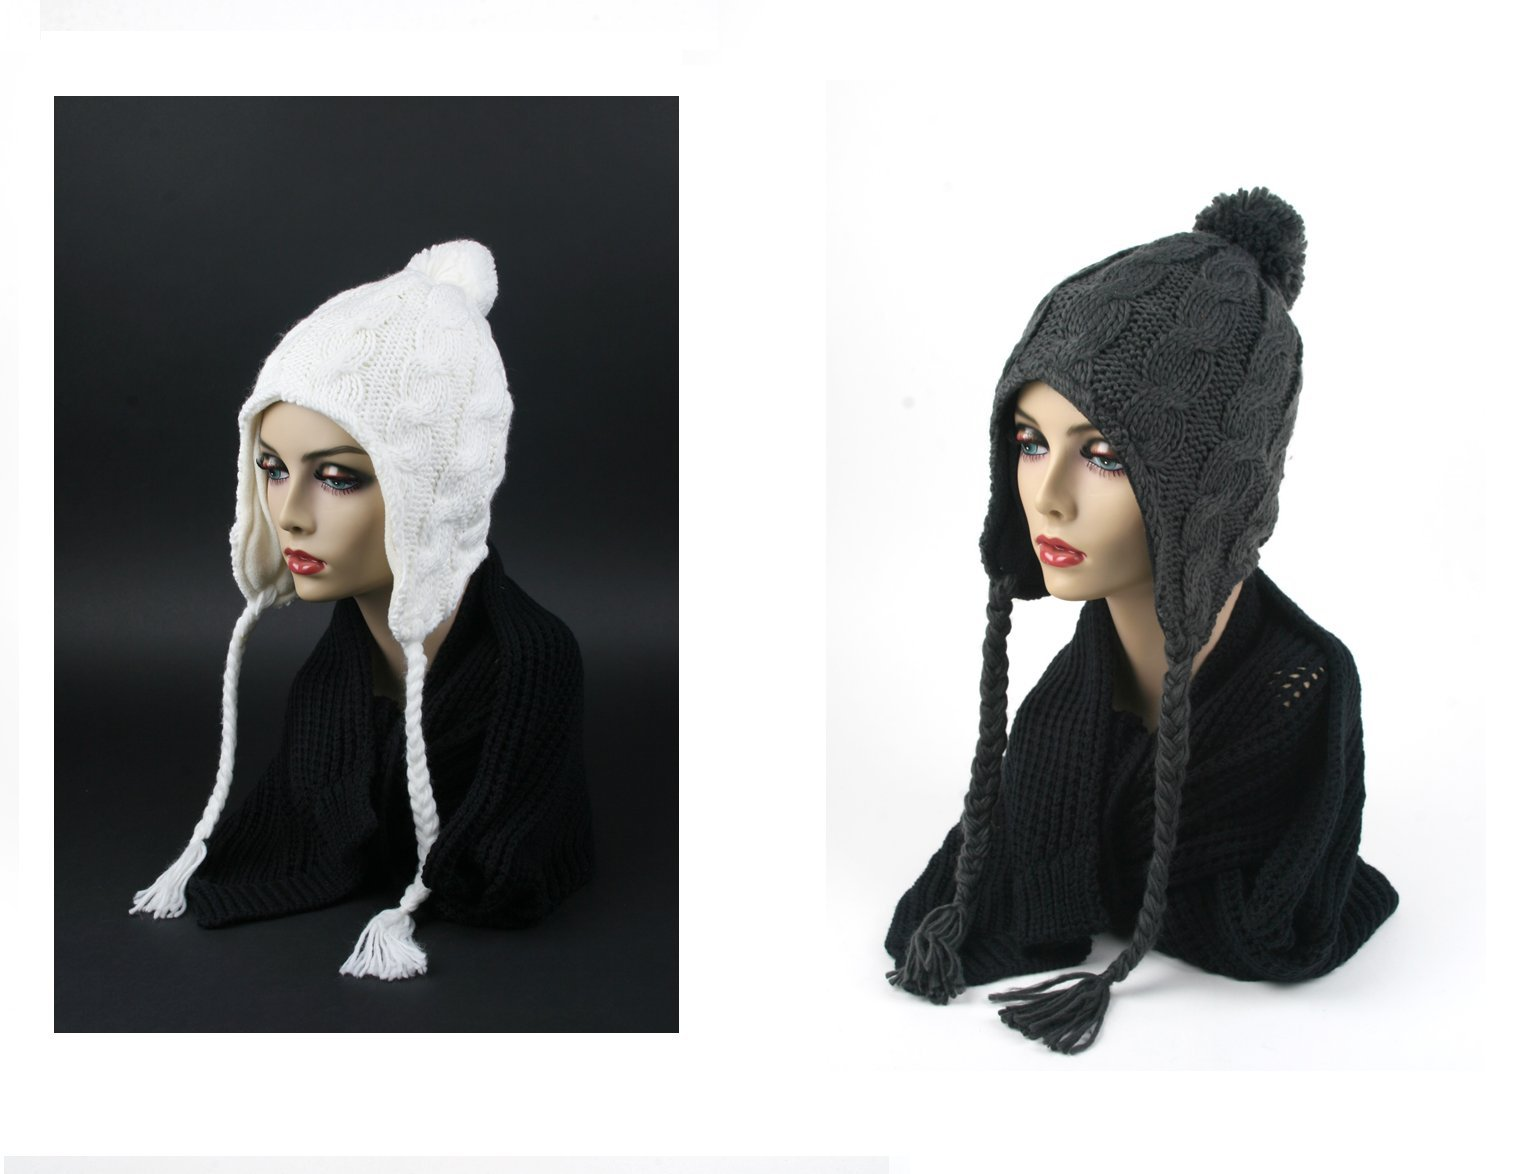 Pop Fashionwear Women's Trapper Knit Winter Ear Flap Hat P212 (2 pcs White & Charcoal)